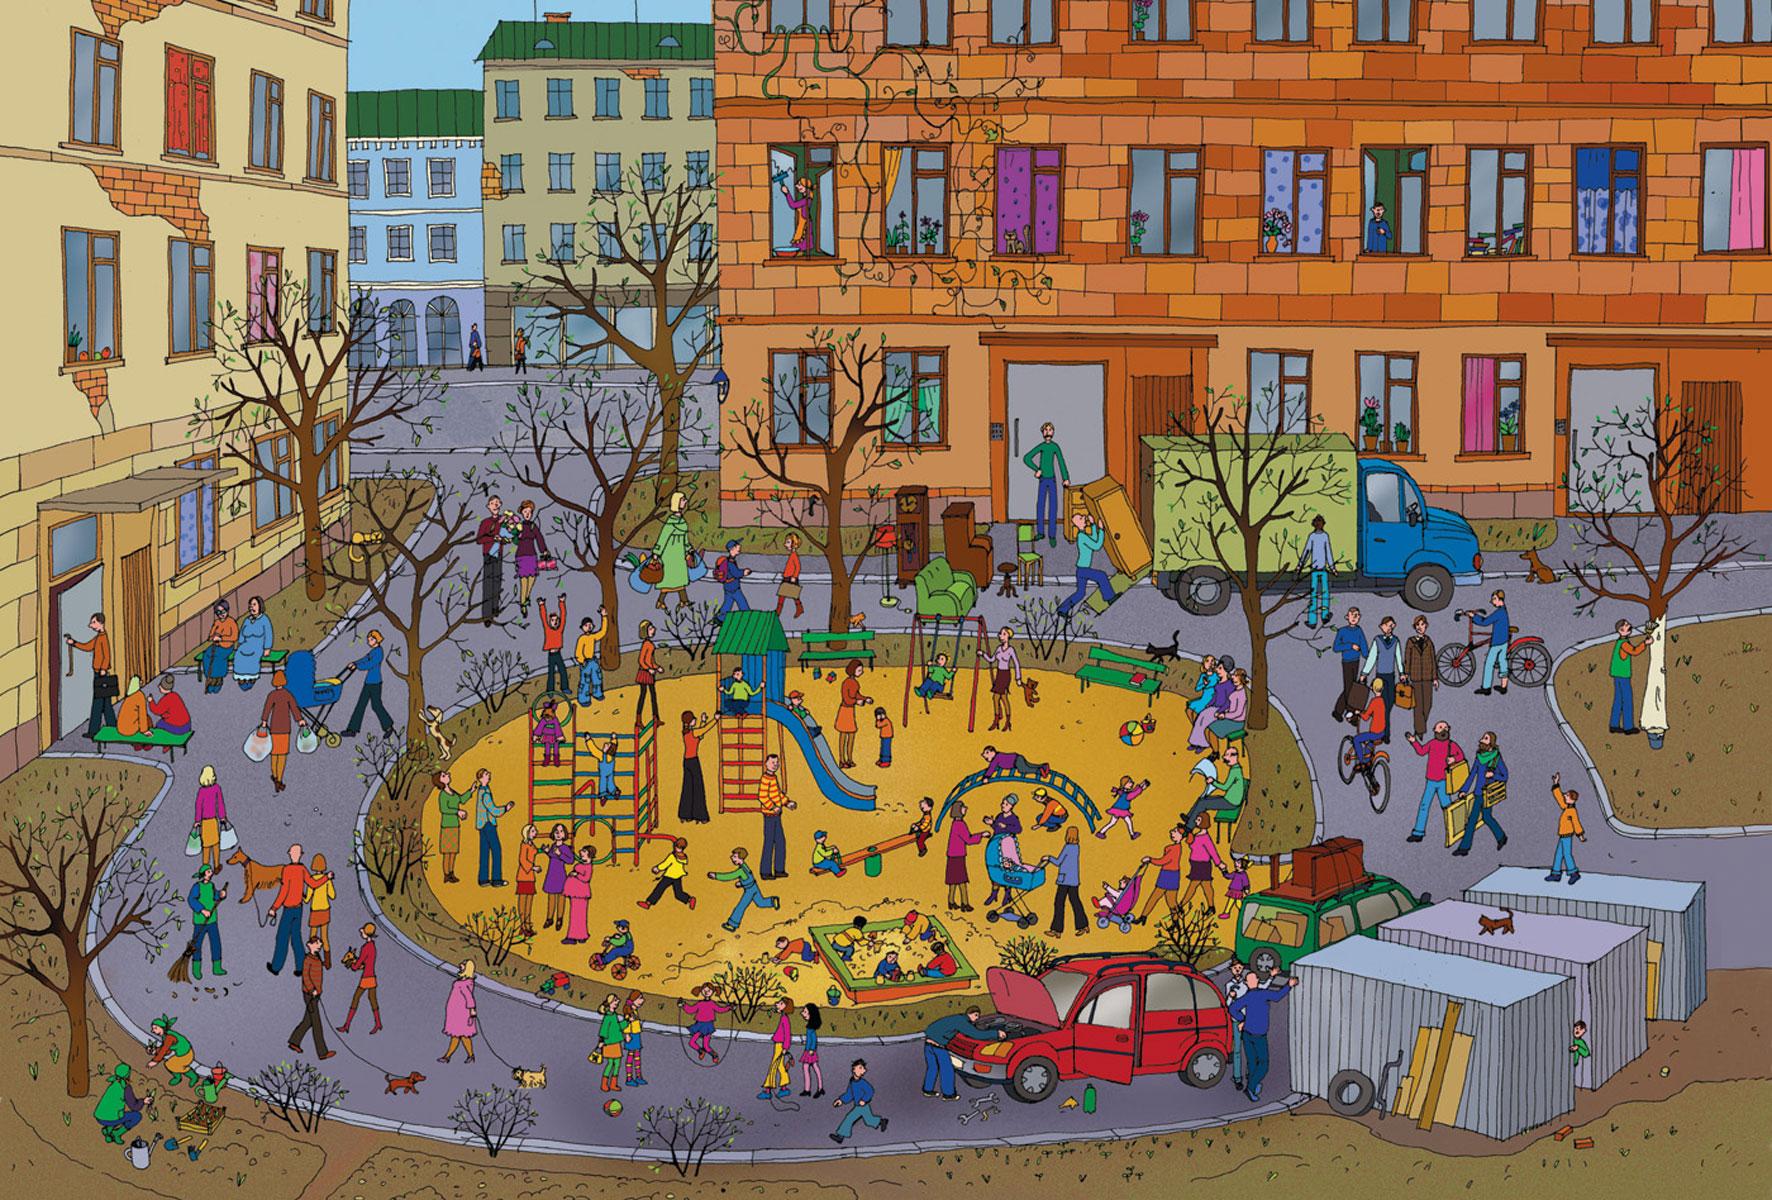 Картинки наш город для детского сада, удачи